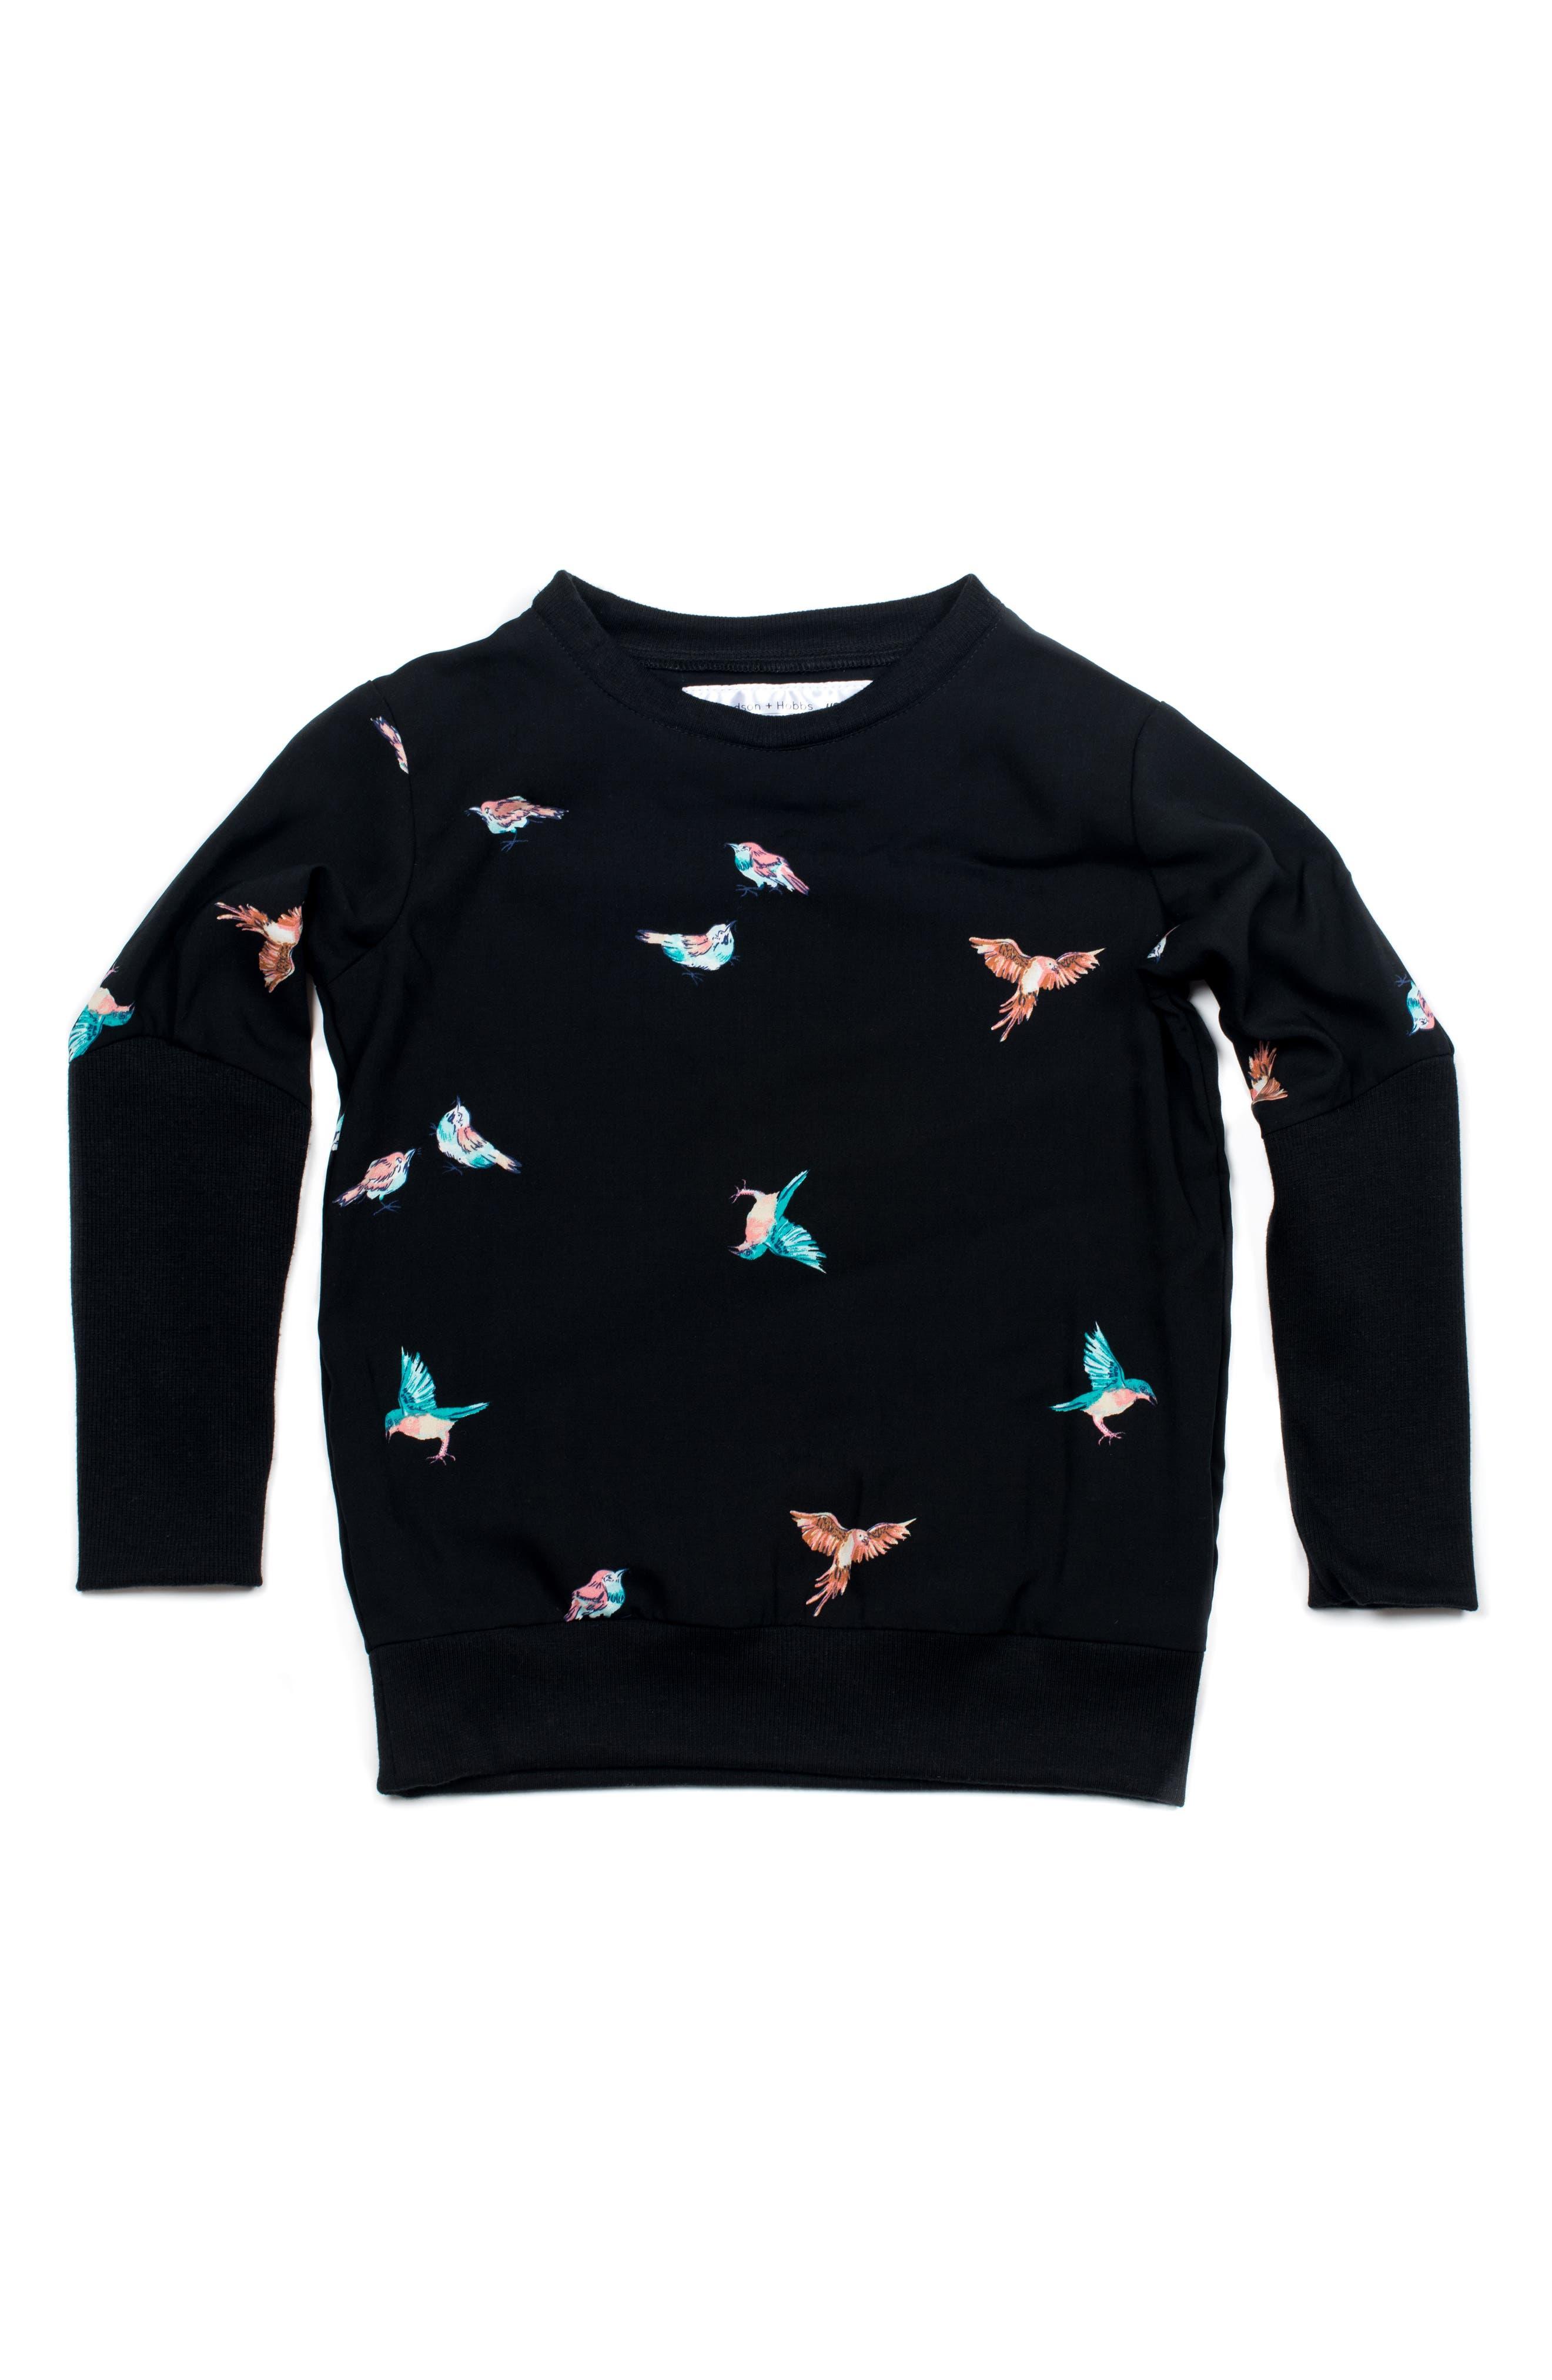 HUDSON + HOBBS,                             Summer Bird Woven Shirt,                             Main thumbnail 1, color,                             001